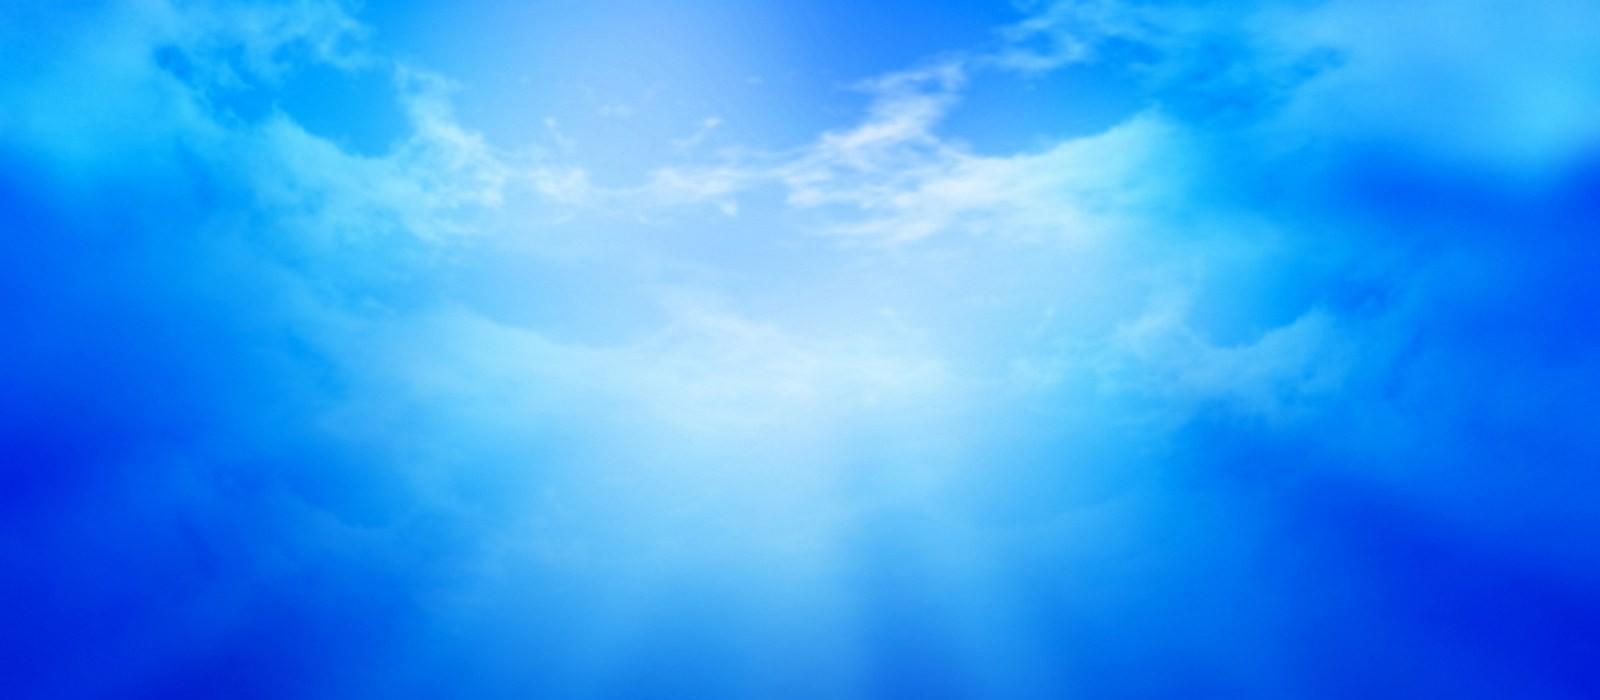 sky-wallpapers-hd-5-e1377574275995